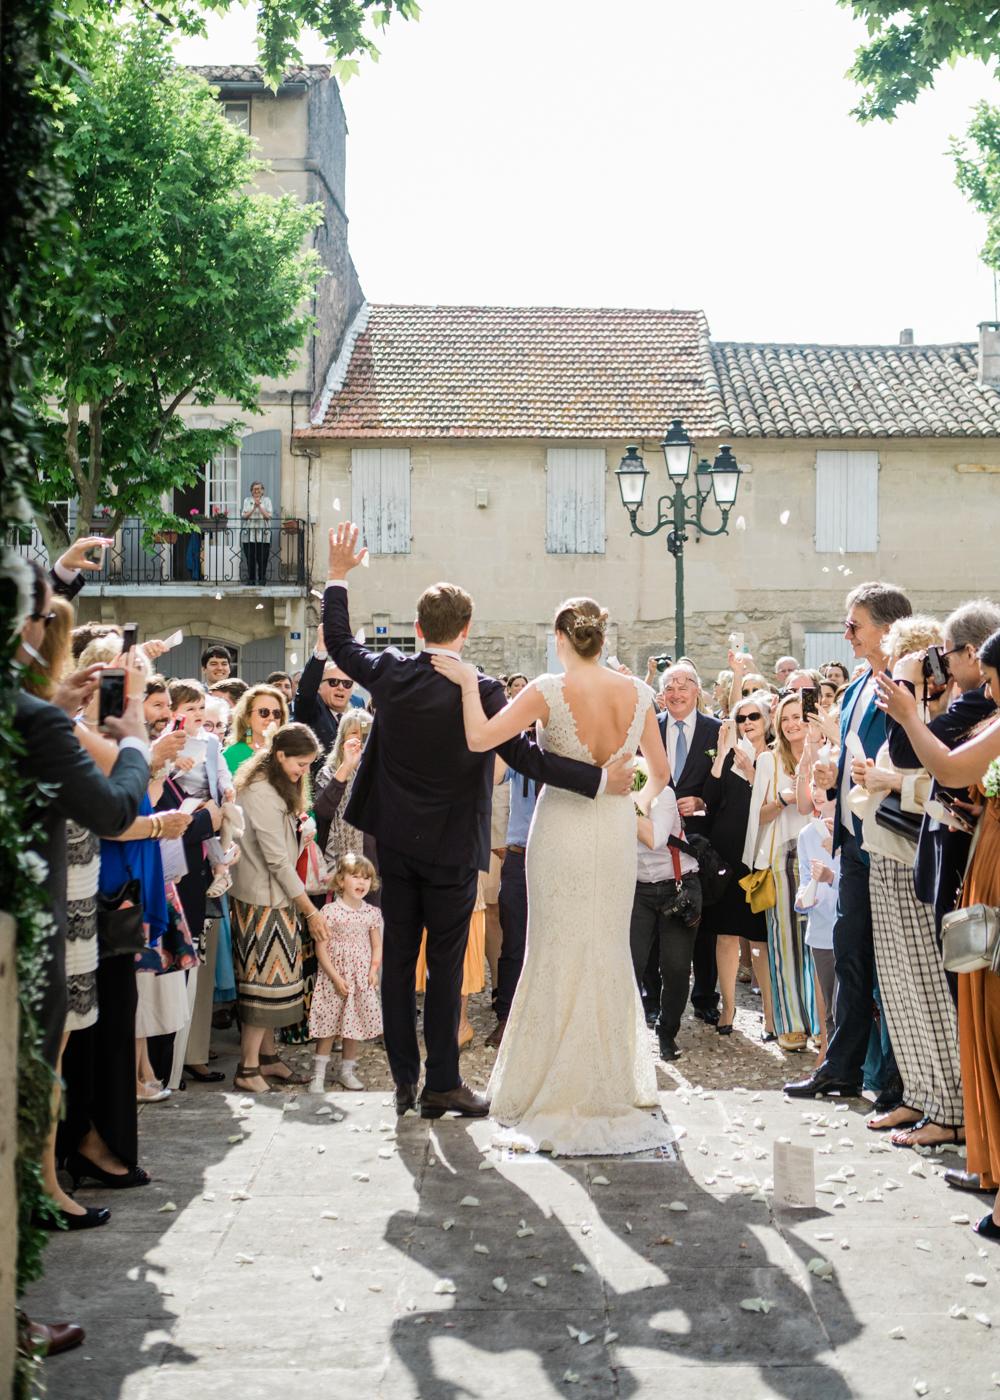 Provence_Wedding_(c)_Rory_Wylie-95.jpg